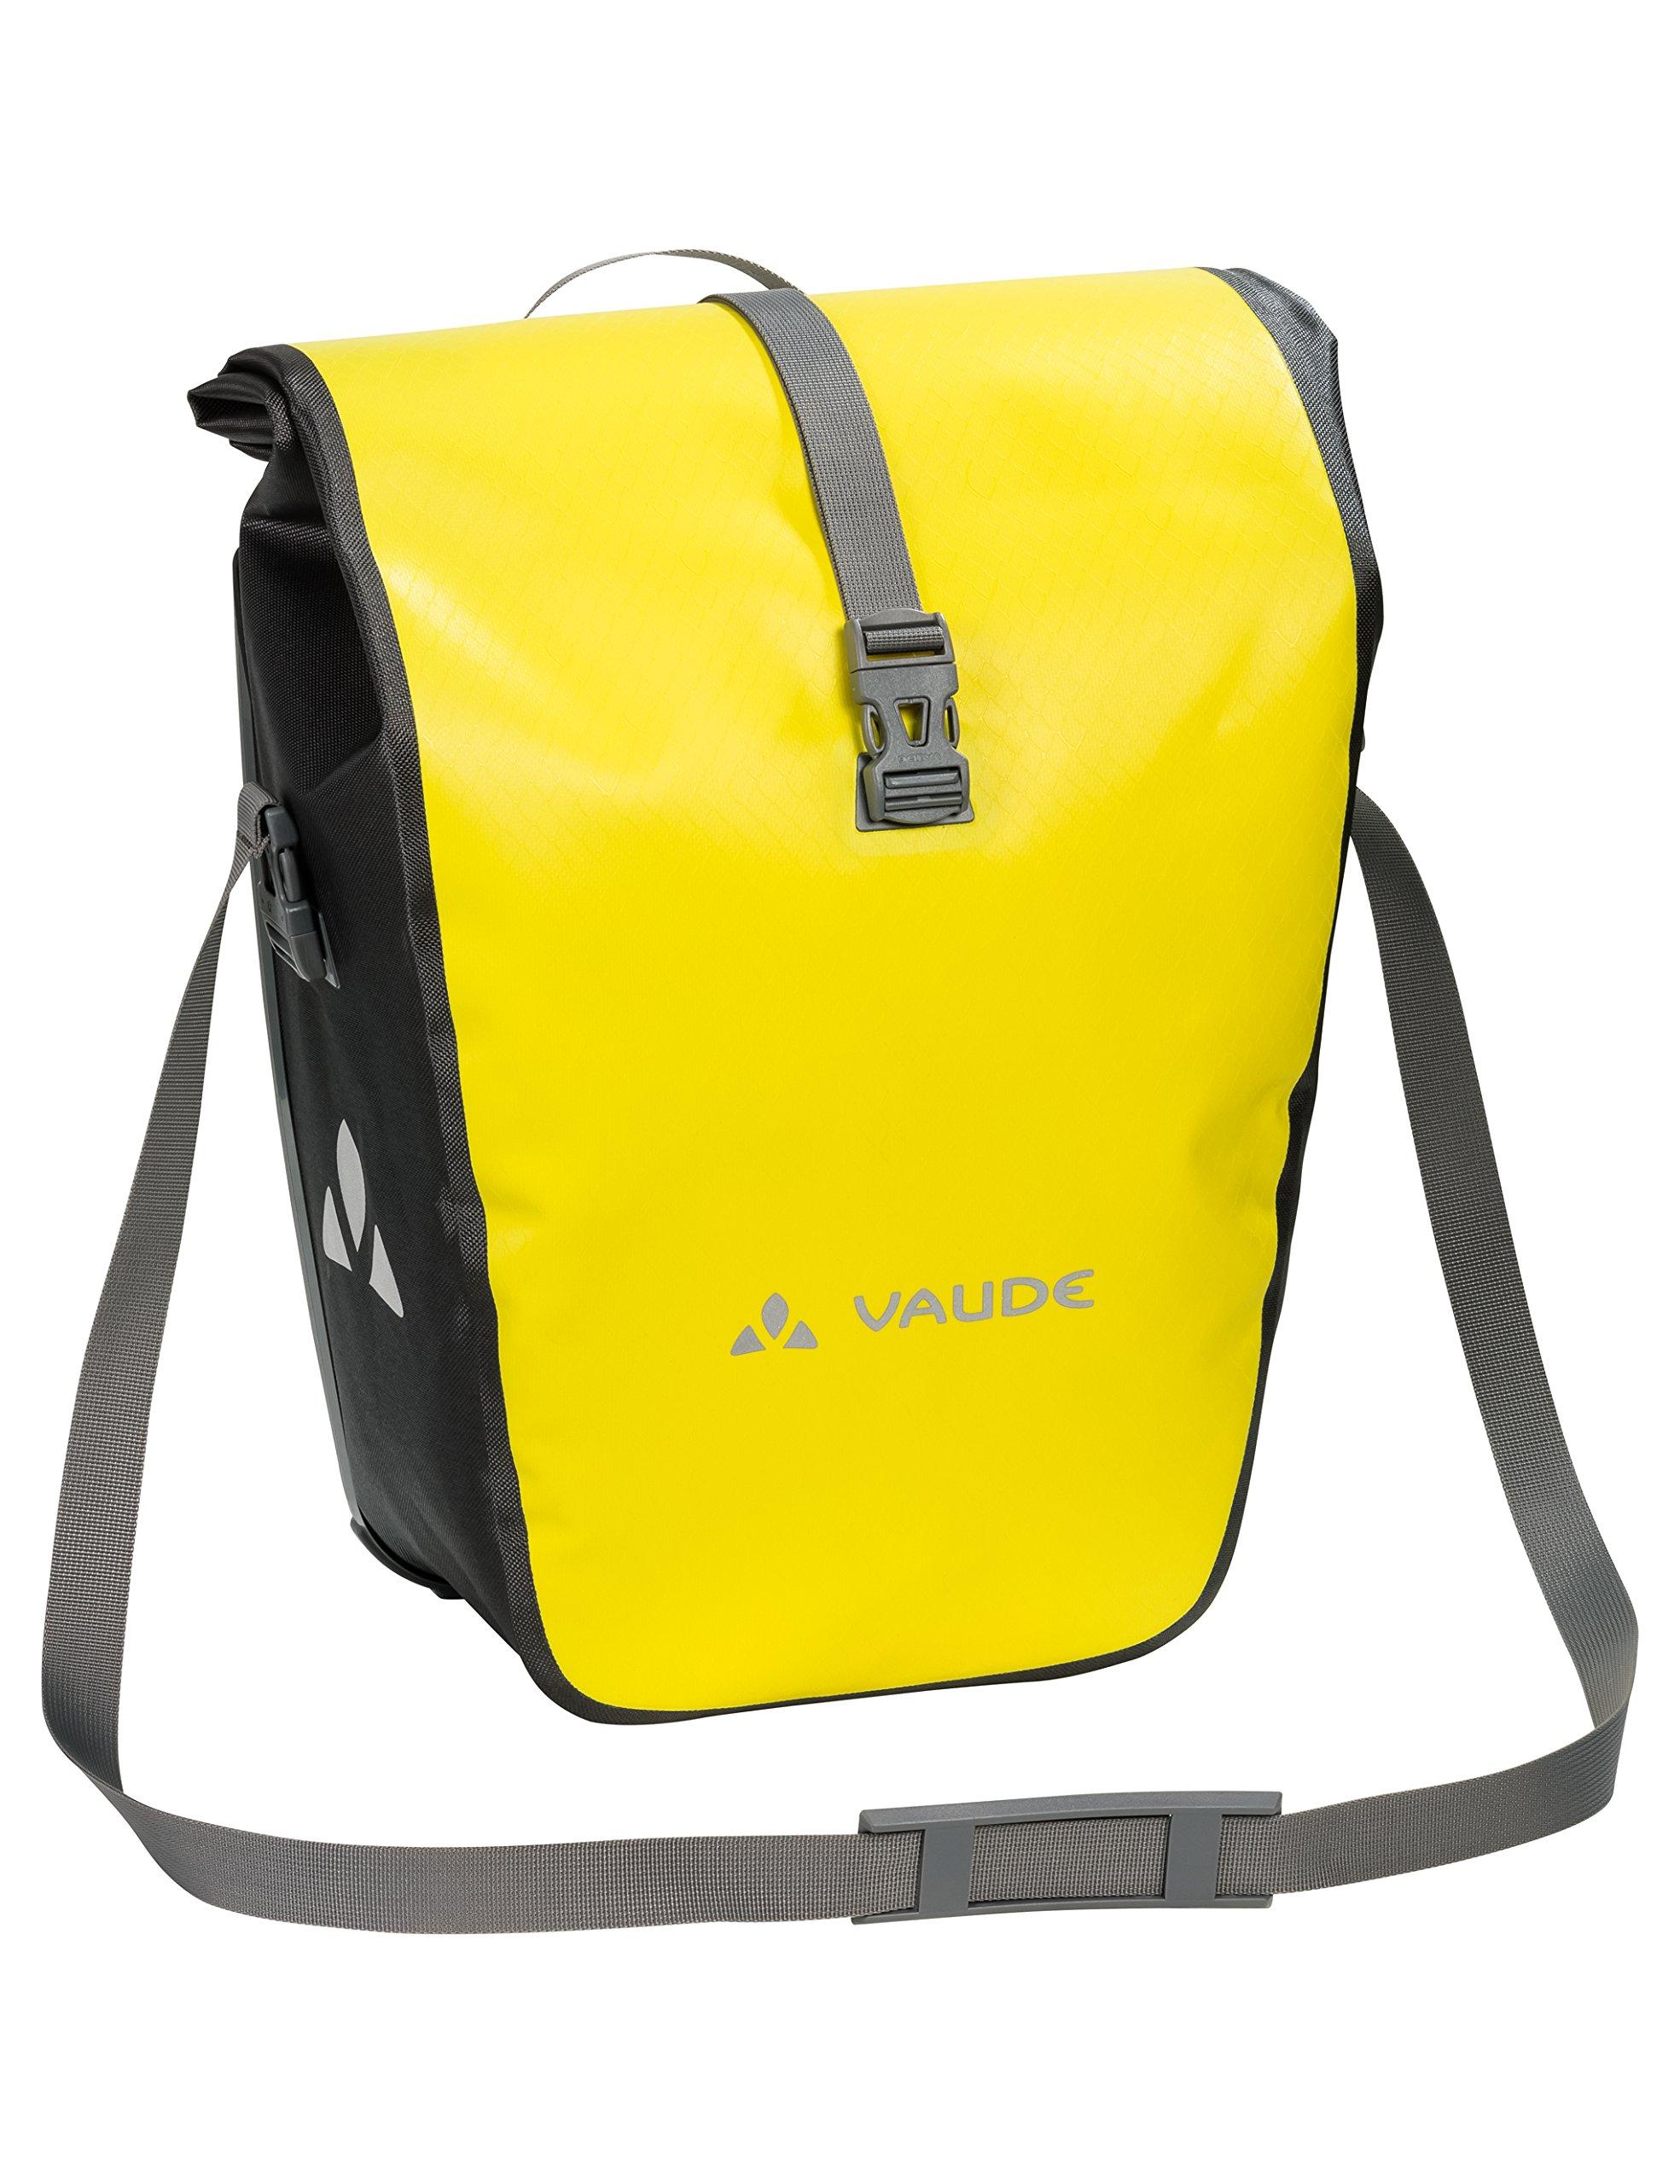 VAUDE Aqua Back – Juego de 2 bolsas para bici adaptables a la carga e impermeables, Amarillo (Canary), Talla única